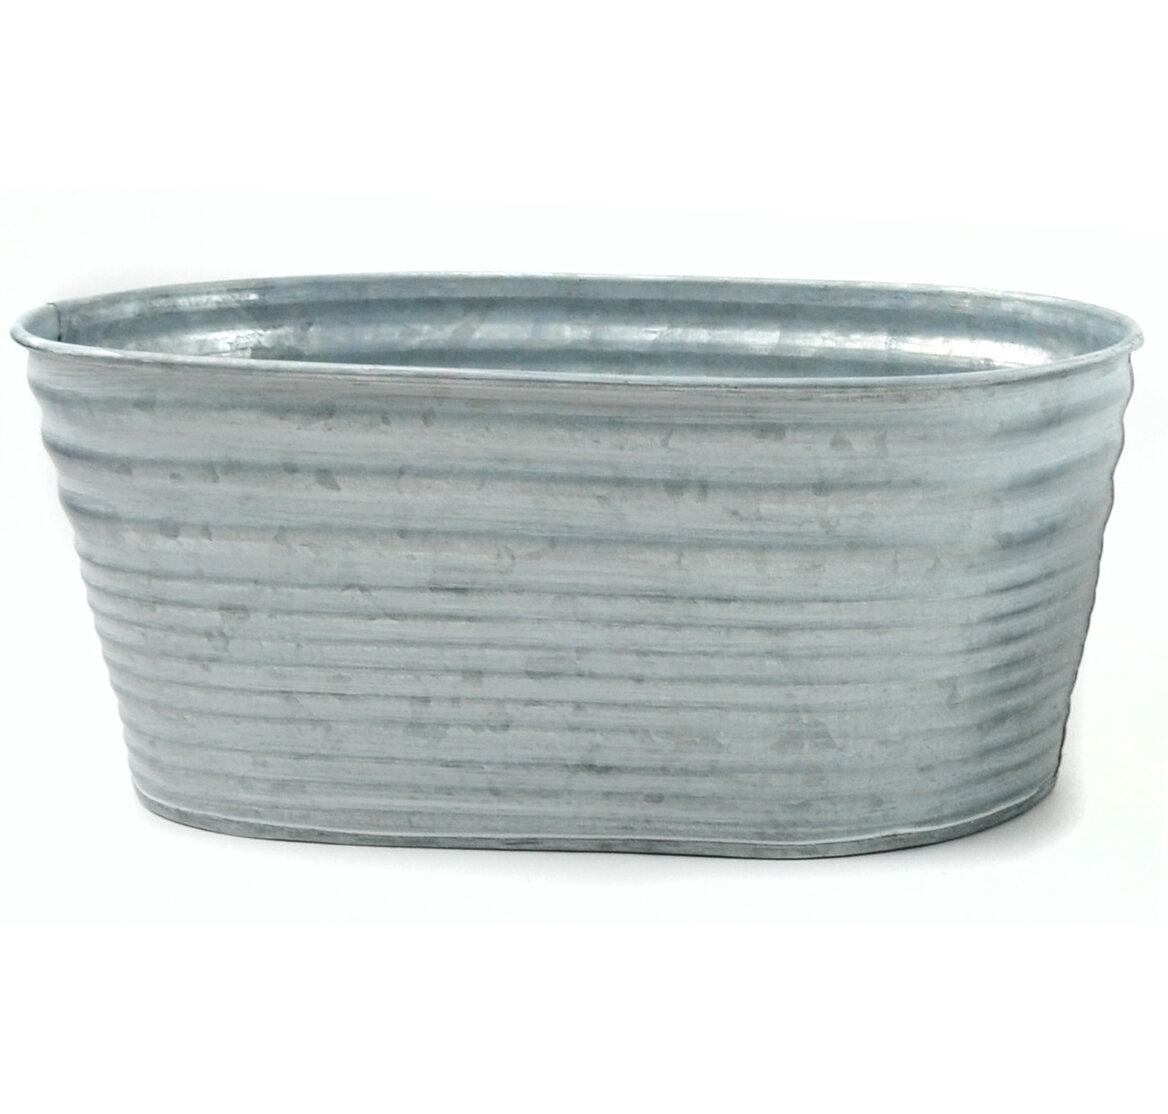 Gracie Oaks Galvanized Tin Oblong 3 Piece Bucket Set Reviews Wayfair